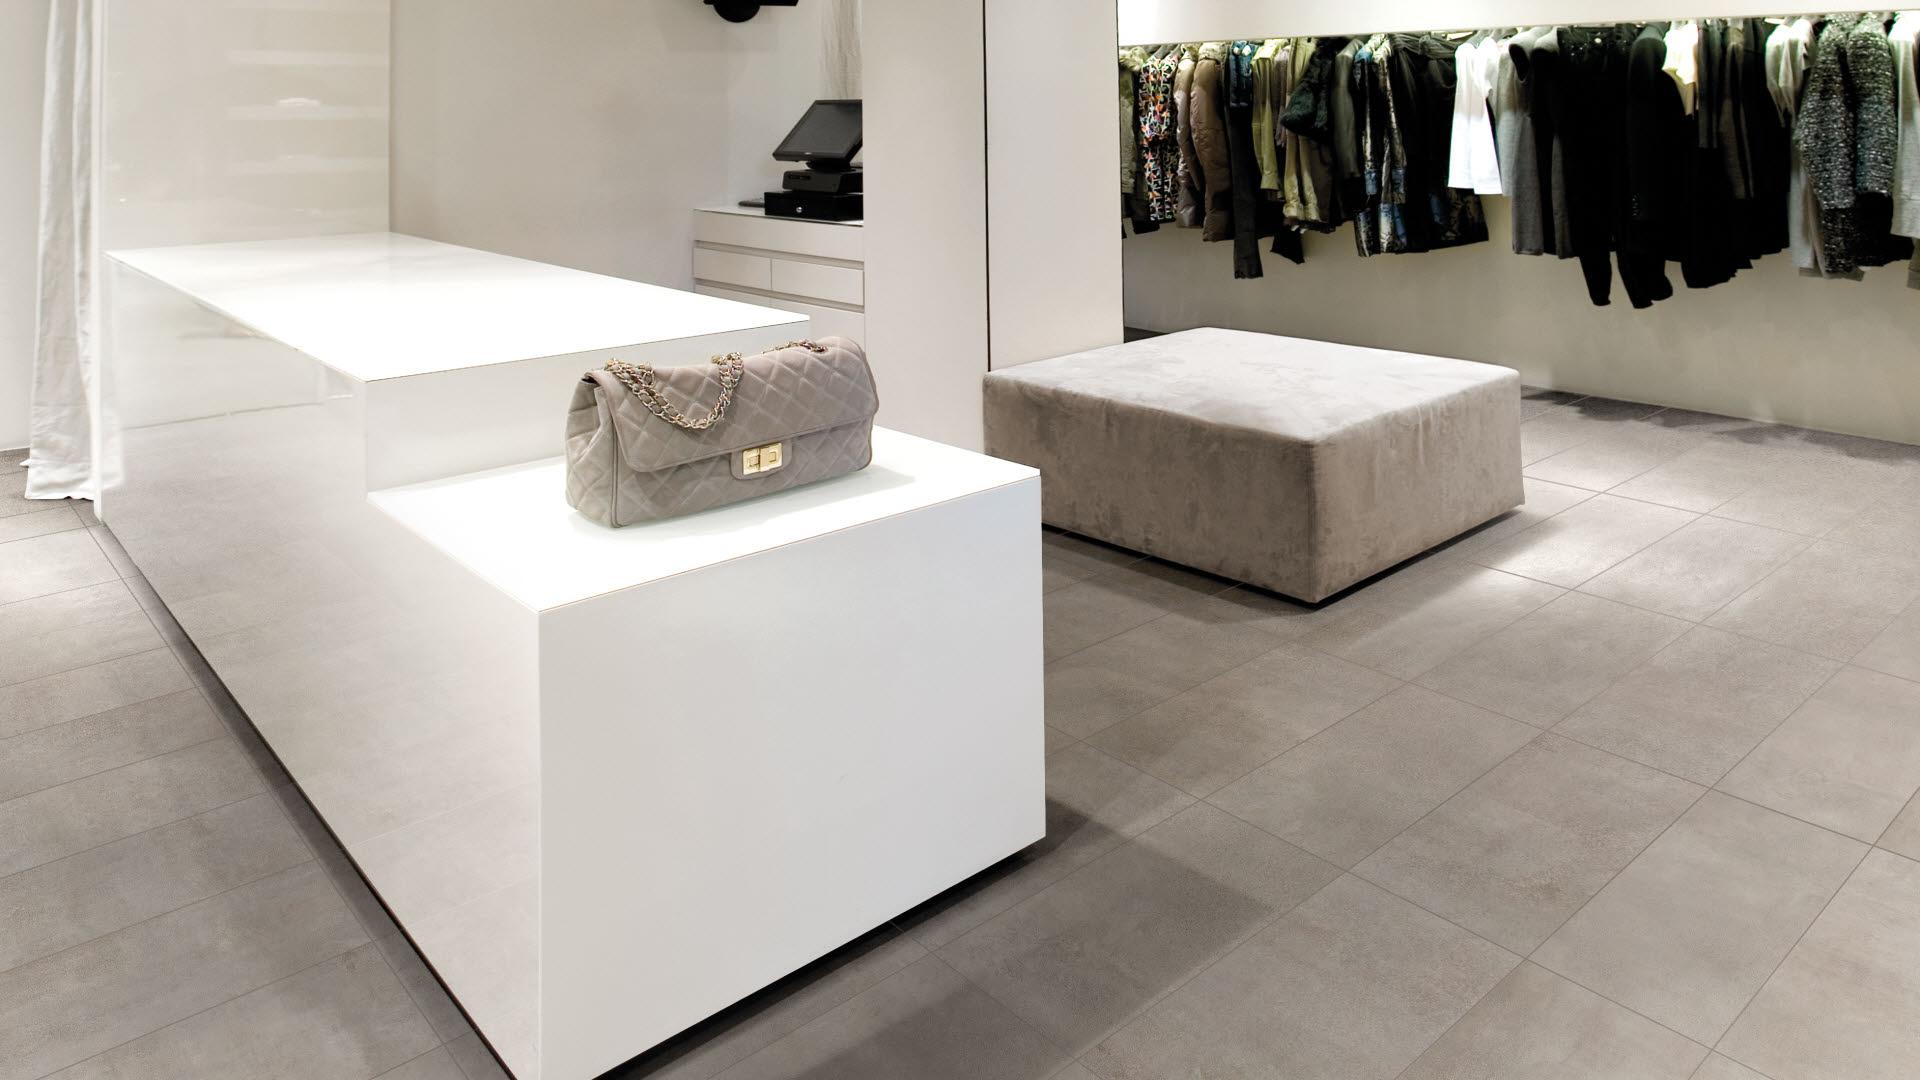 Dla ba cotto petrus extra tappeto fume 60x120 cm naturale - Cotto petrus piastrelle ...